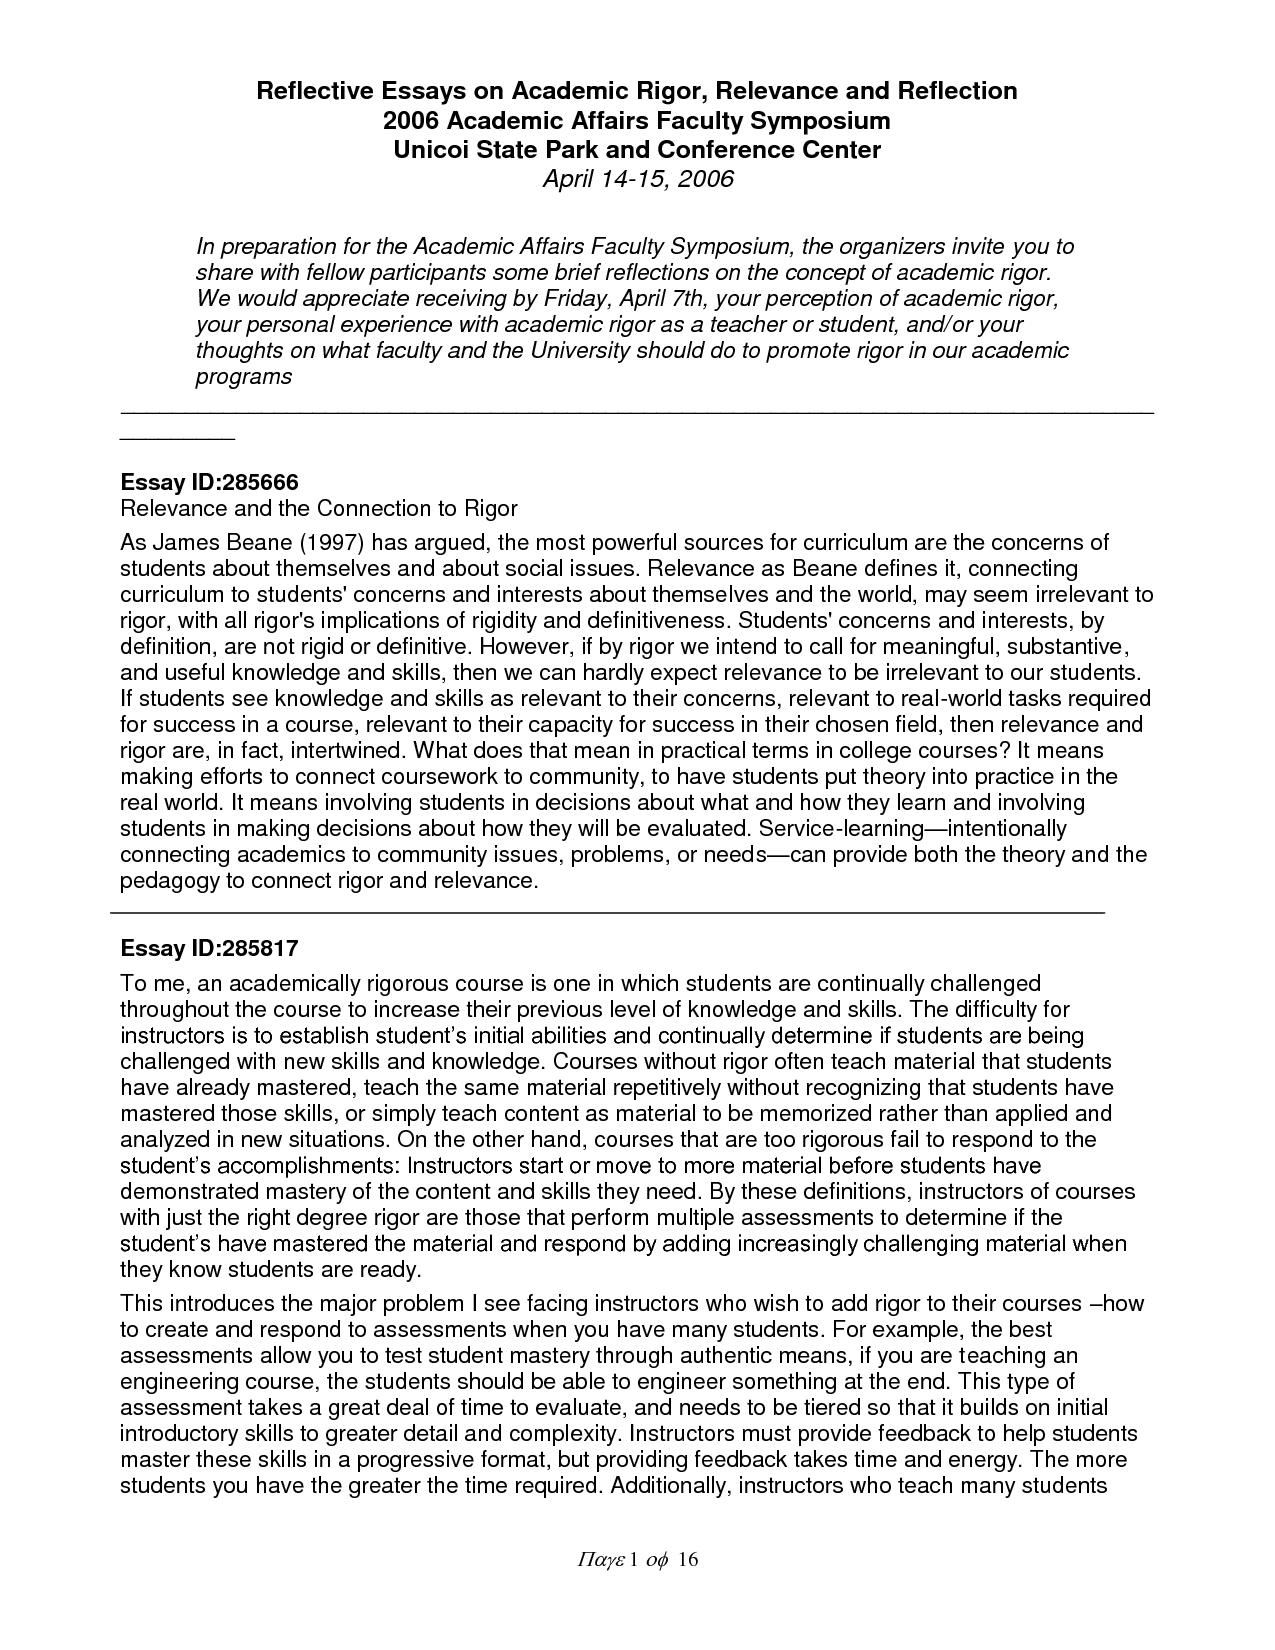 007 Descriptive Essay About Love Ixora Philippinensis Example Of Family Essays For High School Students Pics Admi Unique Examples Sample Questions Narrative Pdf Full